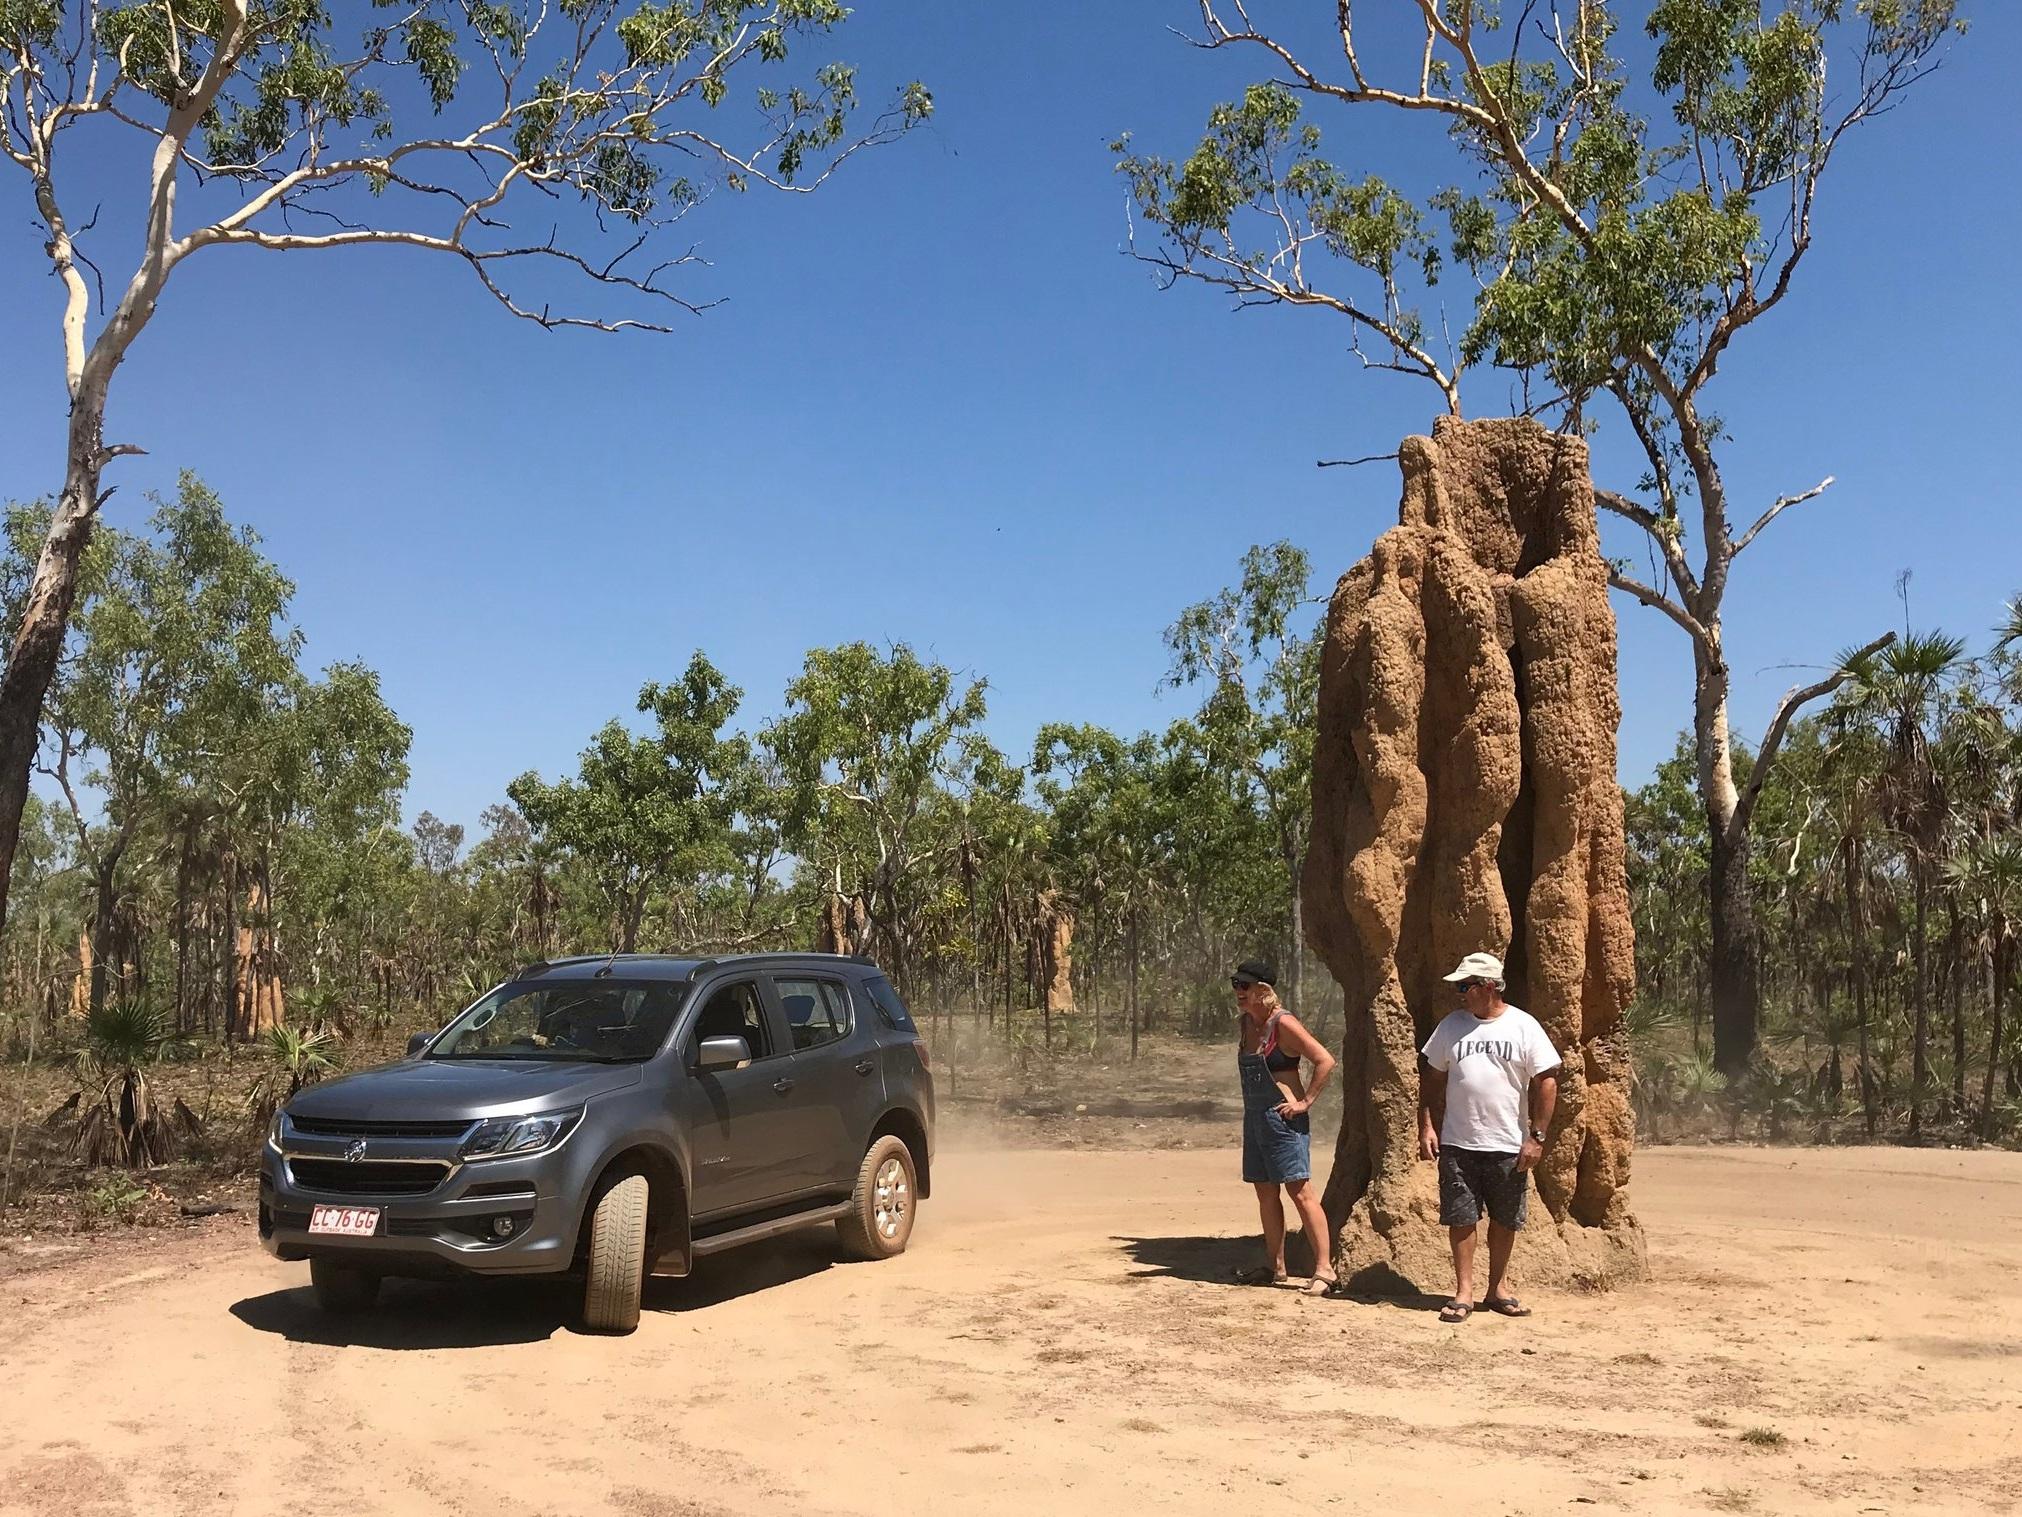 Just a termite mound!